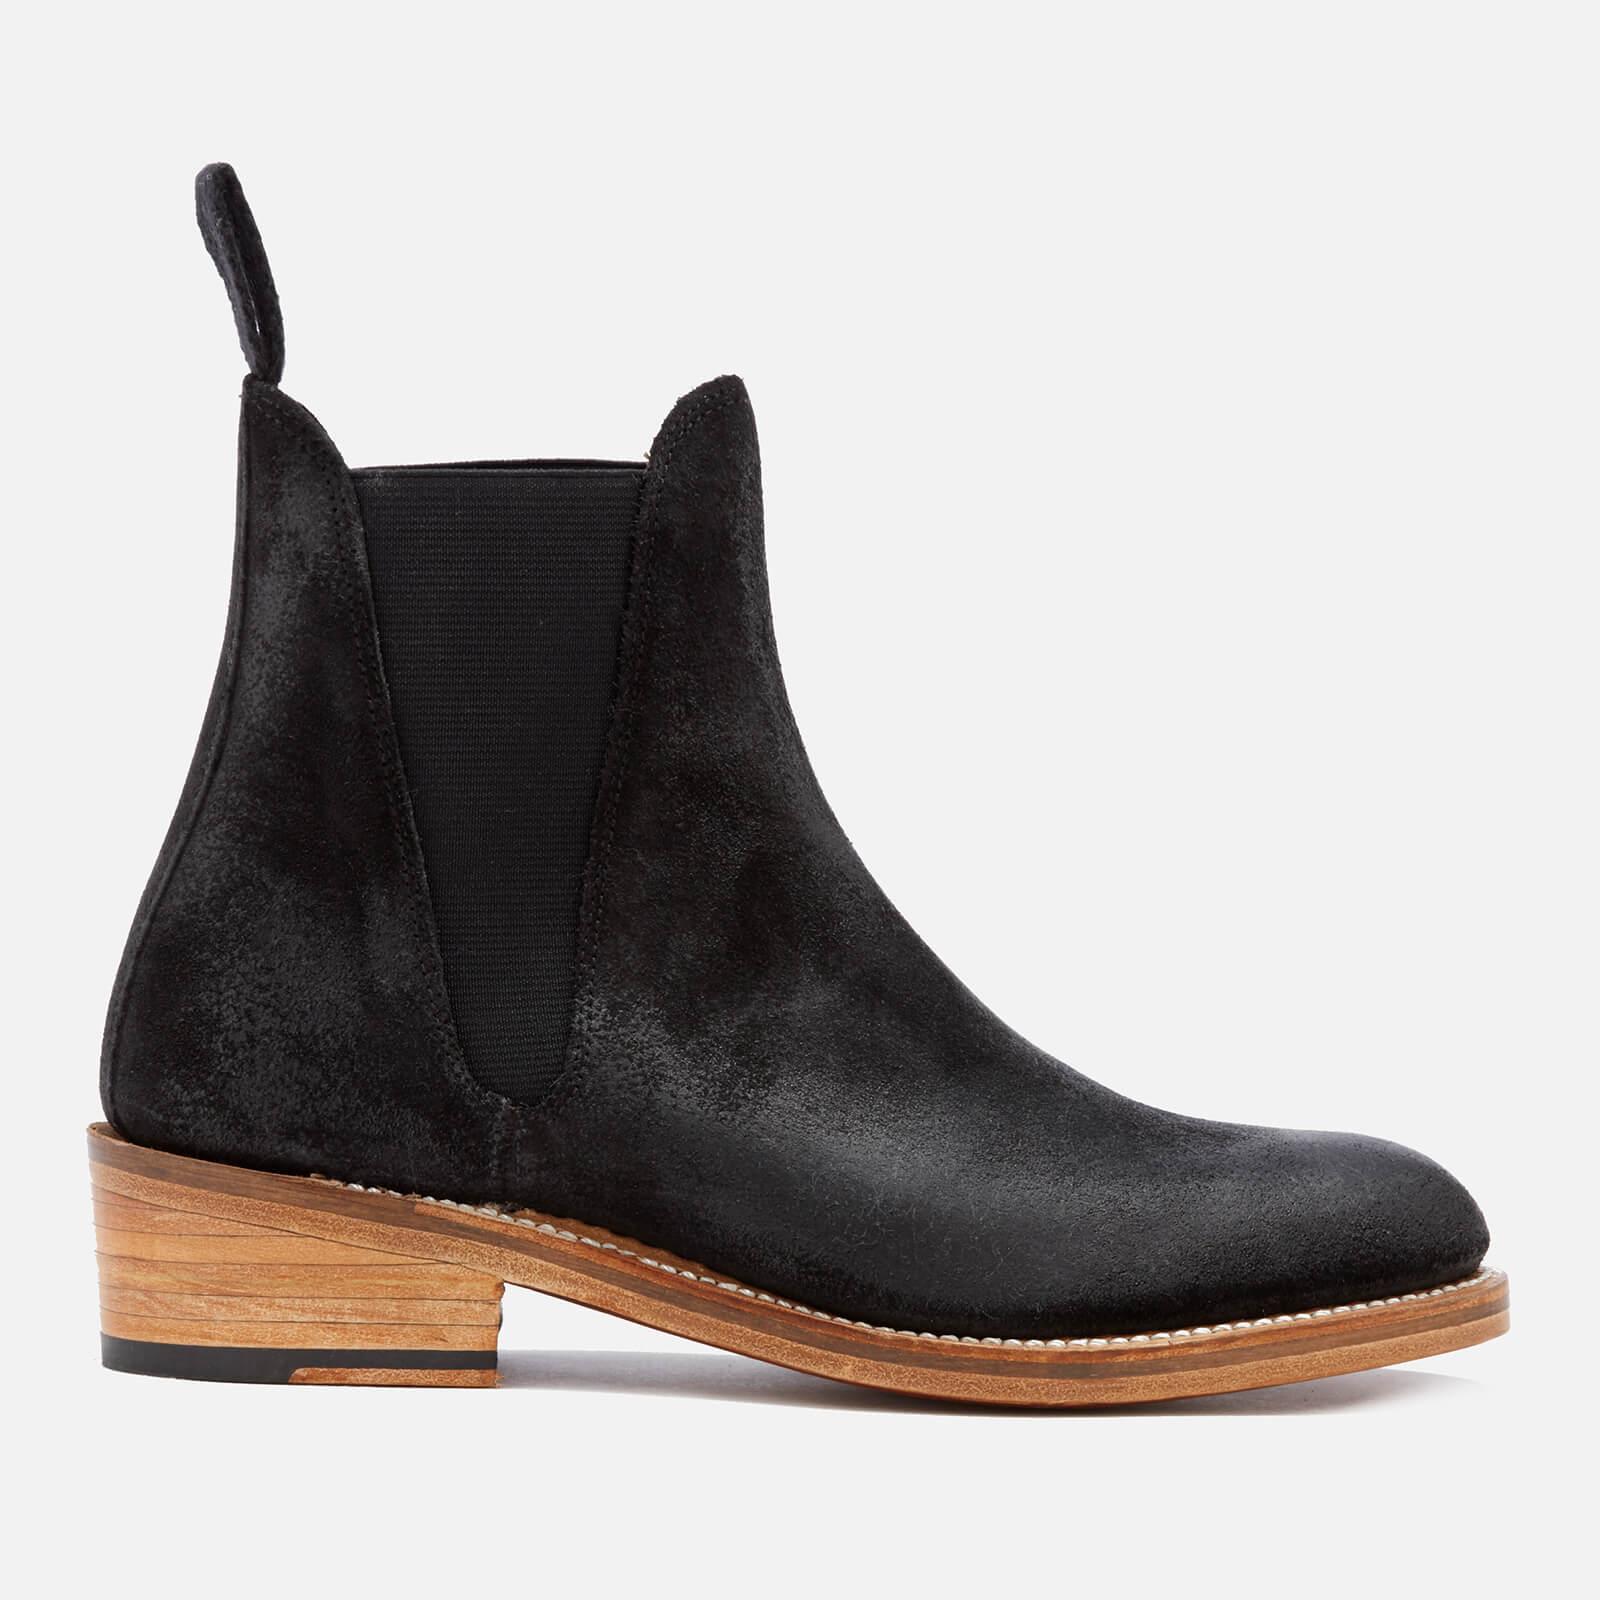 11e78b4e11f Grenson Women's Nora Burnished Suede Chelsea Boots - Black